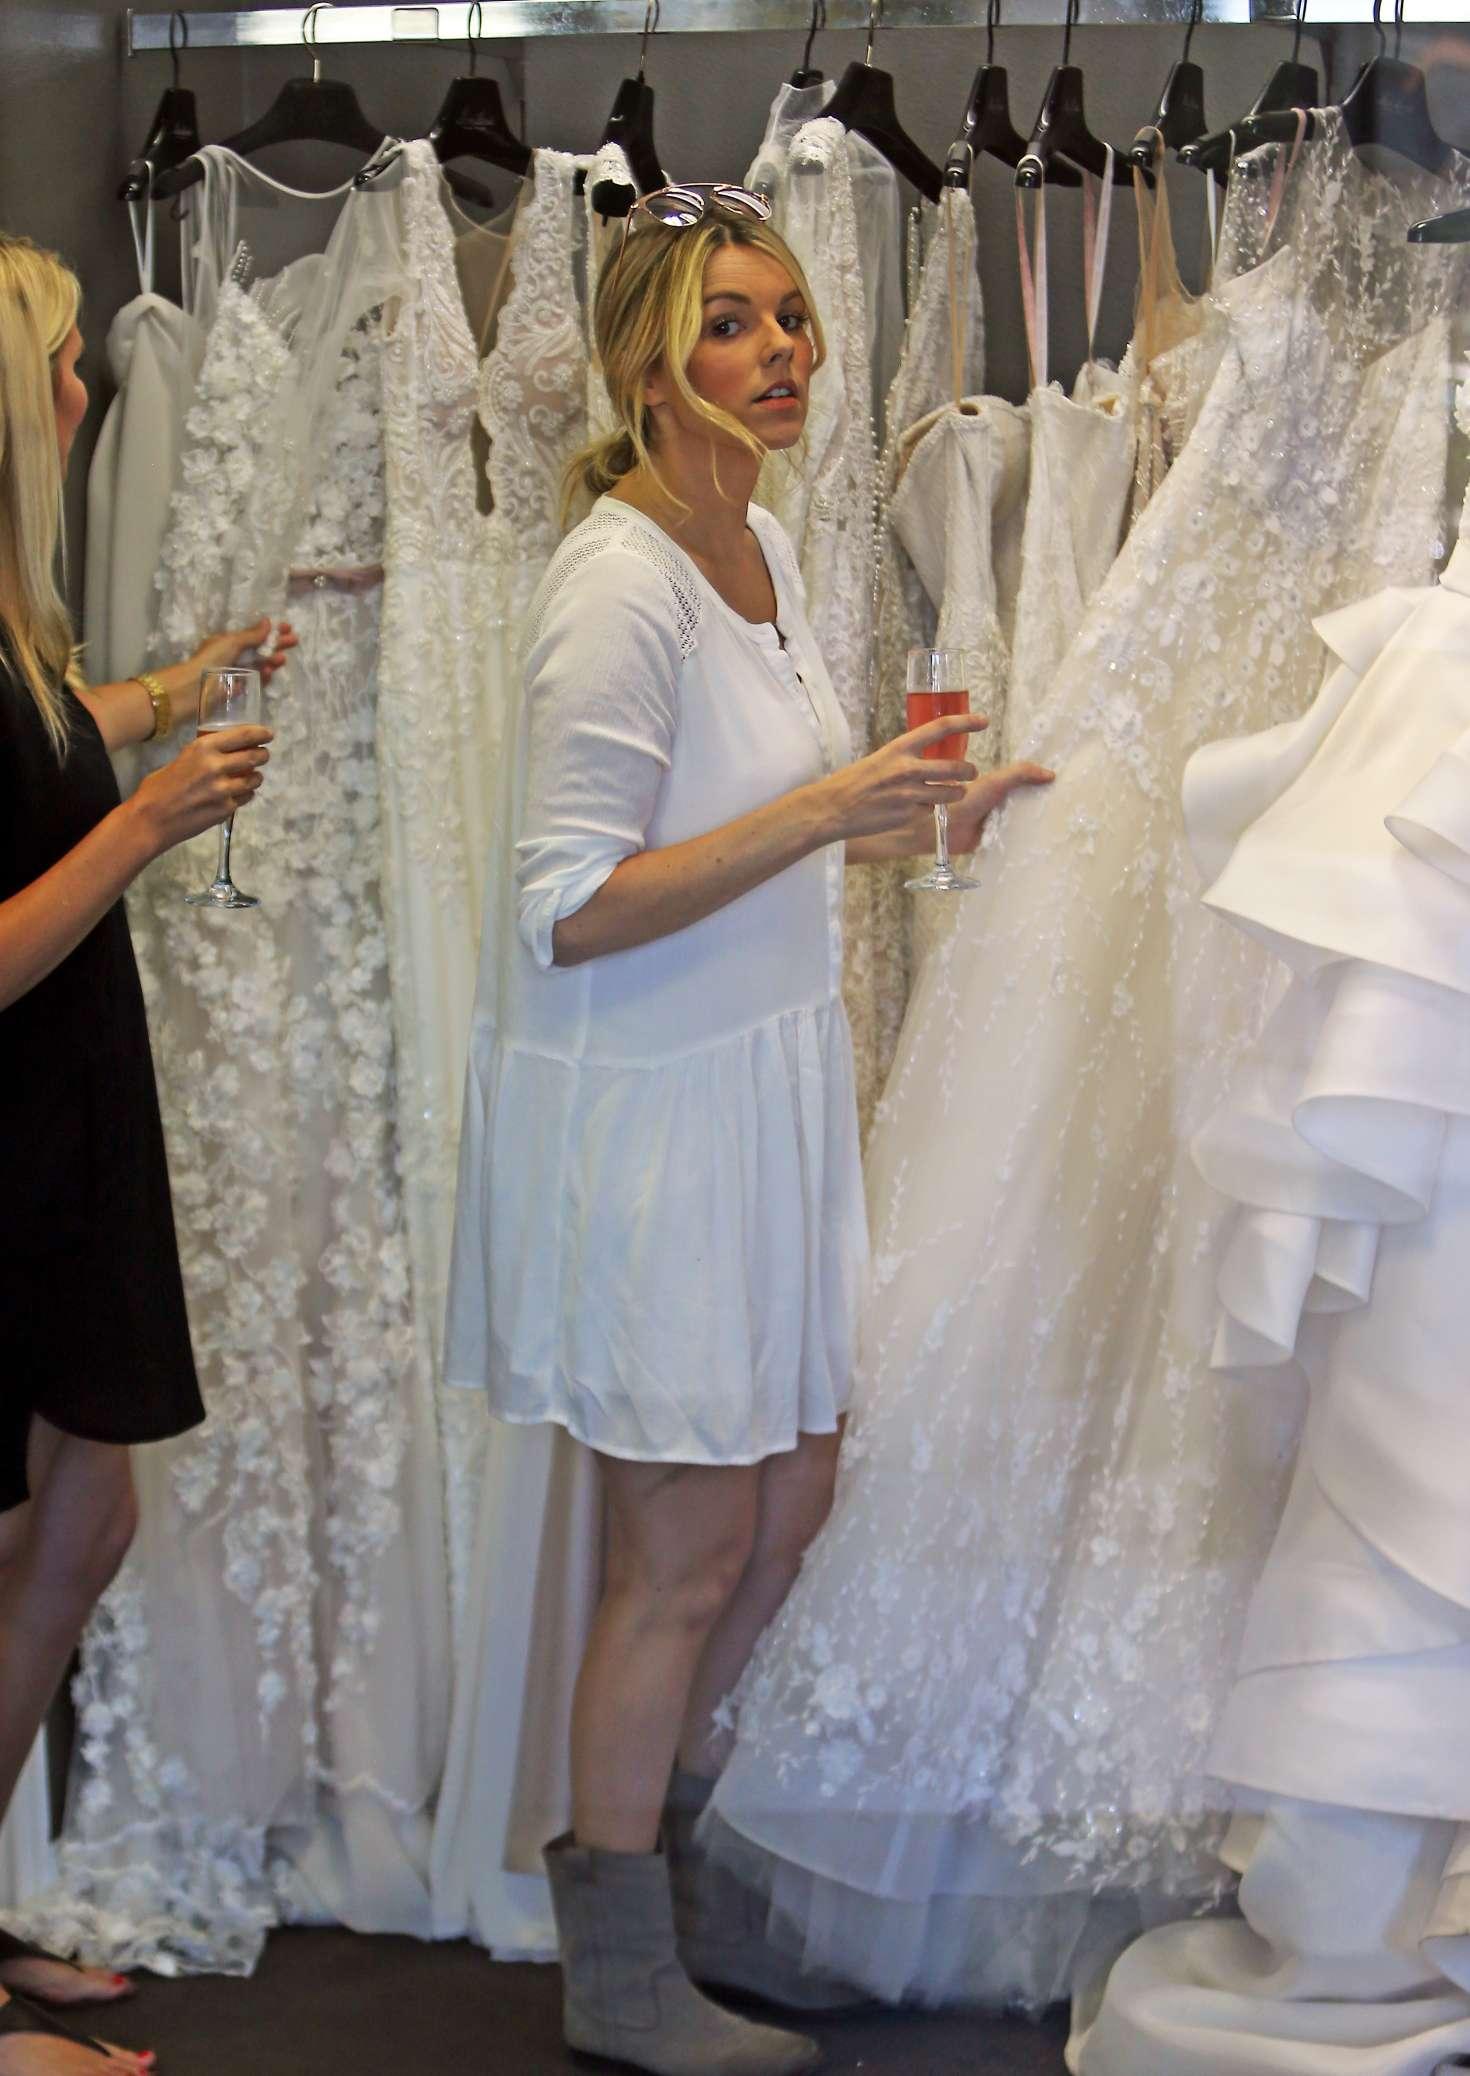 Ali fedotowsky in short dress 11 gotceleb for Mon amie wedding dresses